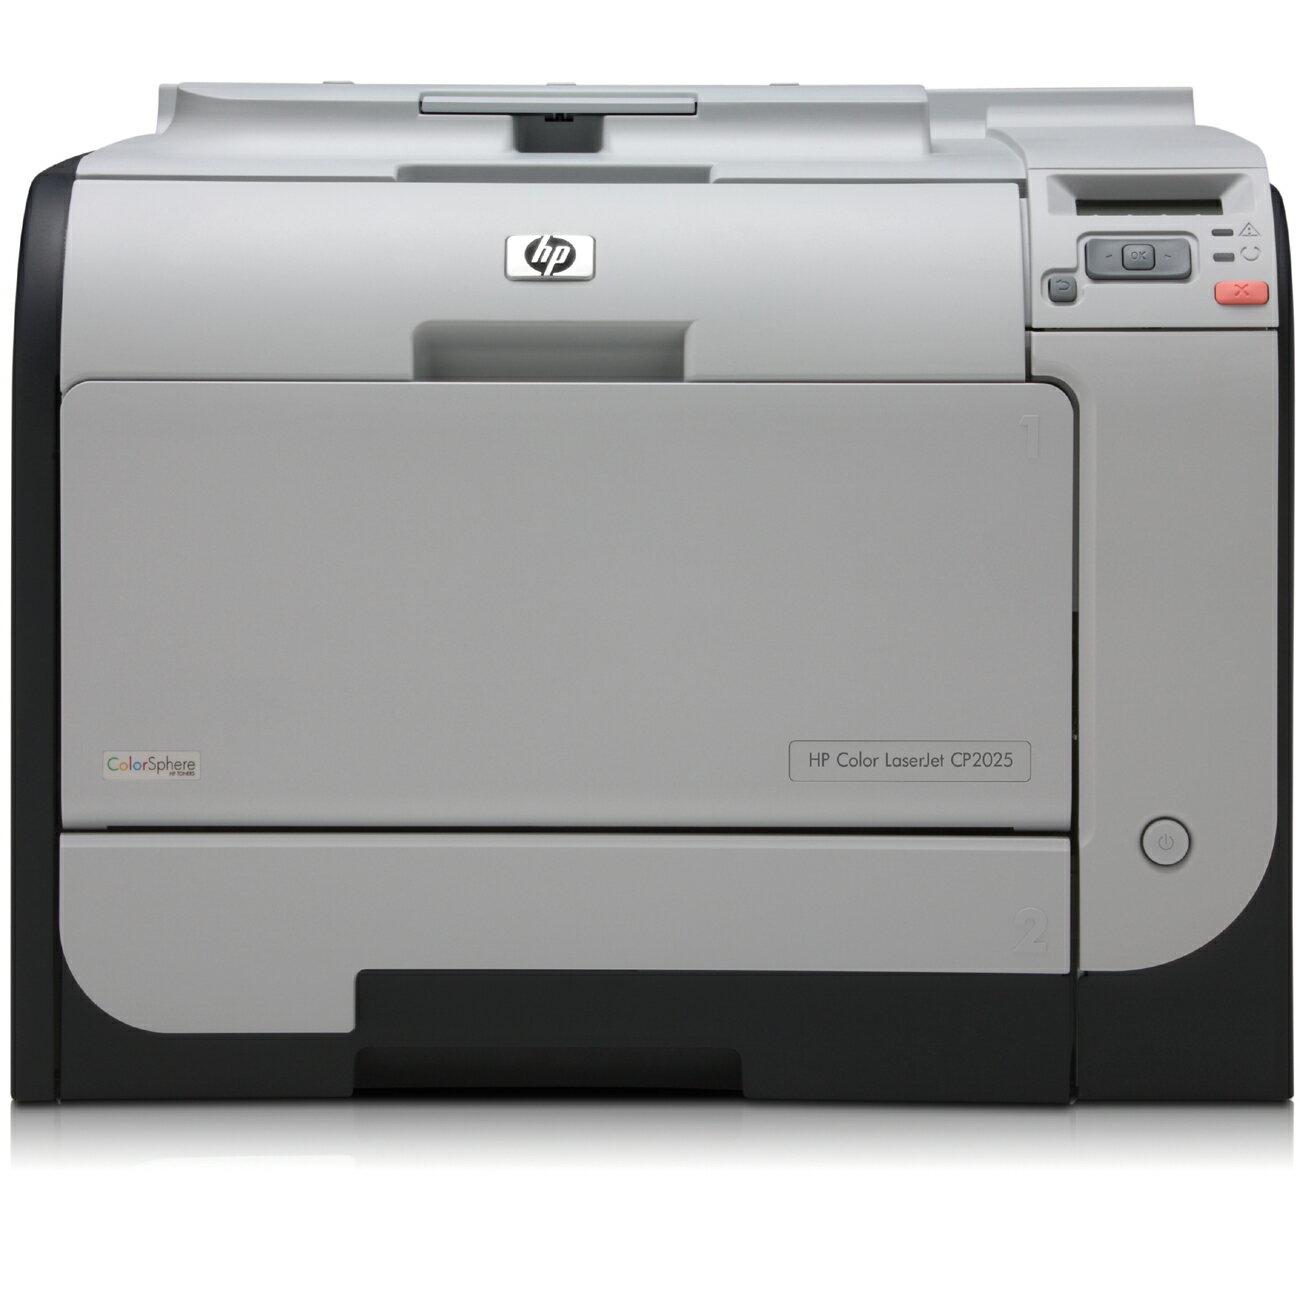 Refurbished HP LaserJet CP2025DN Printer - Color - 600 x 600 dpi - USB - Fast Ethernet - PC, Mac 0